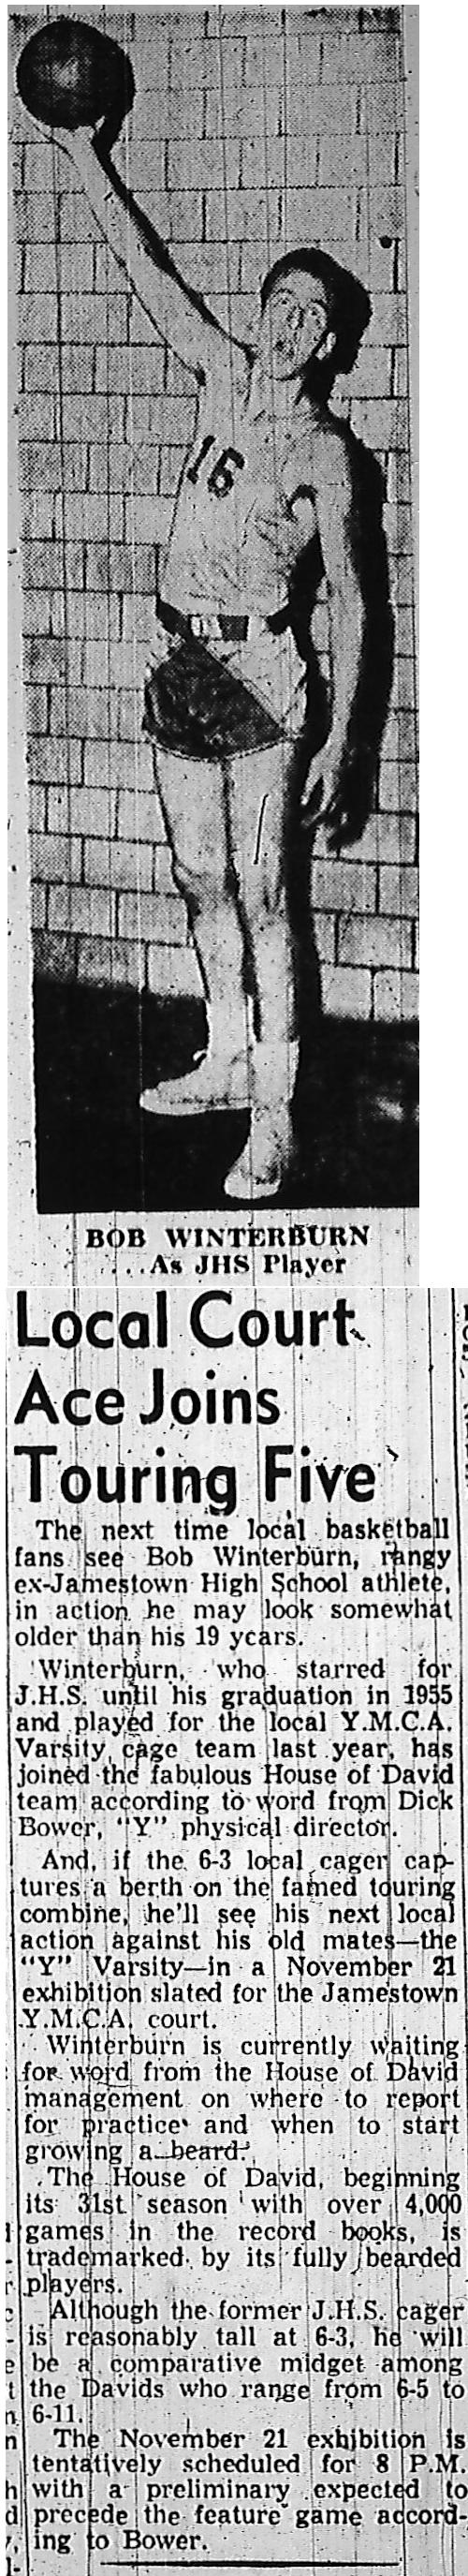 Bob Winterburn - Chautauqua Sports Hall of Fame